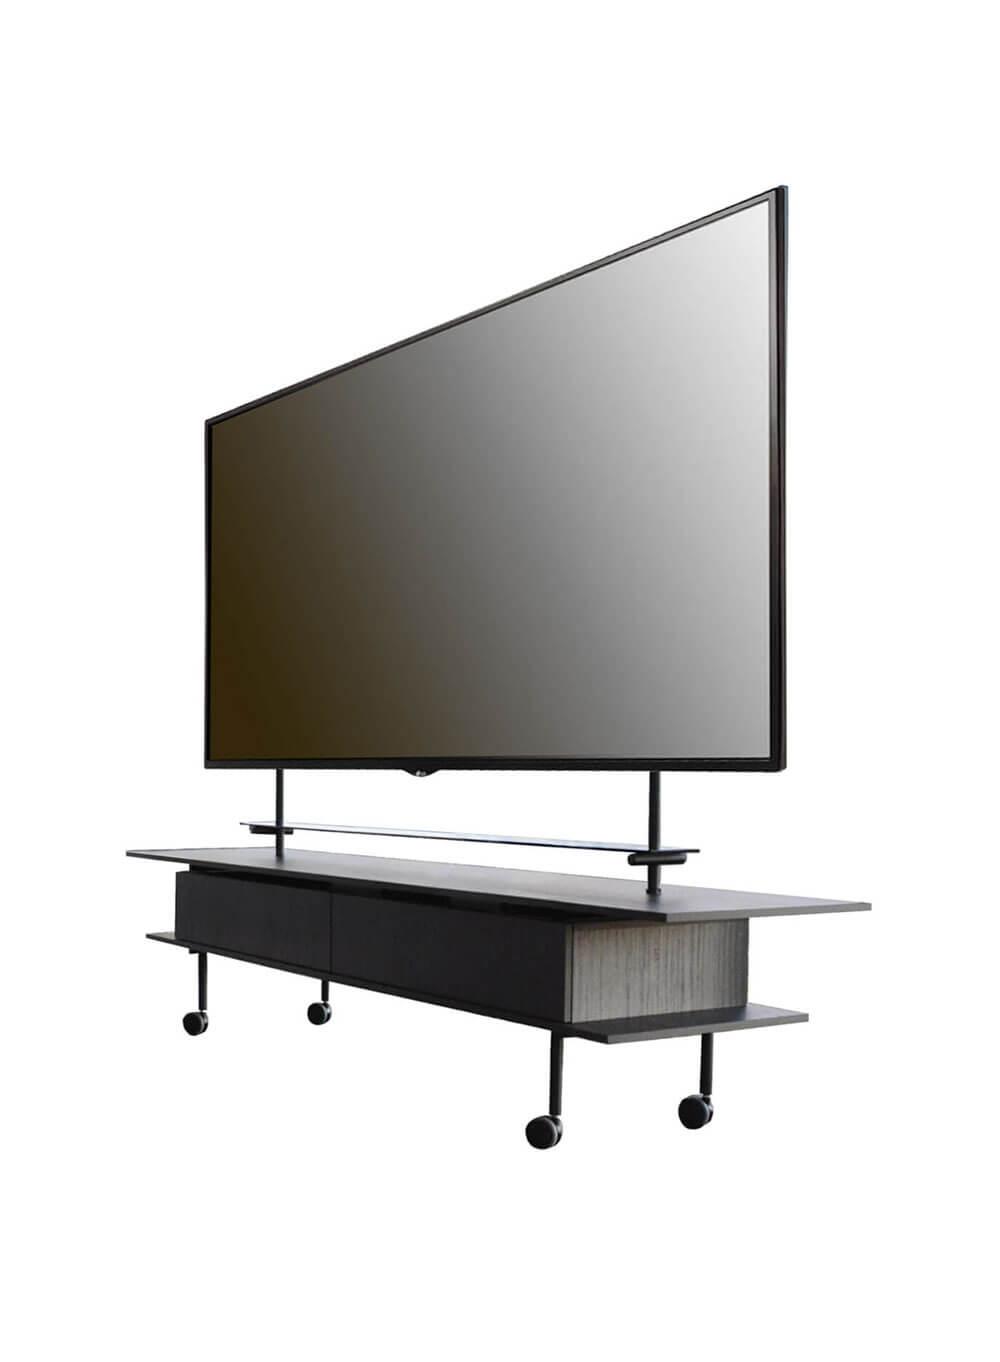 stijlvol smart-LCD-scherm meubelontwerp